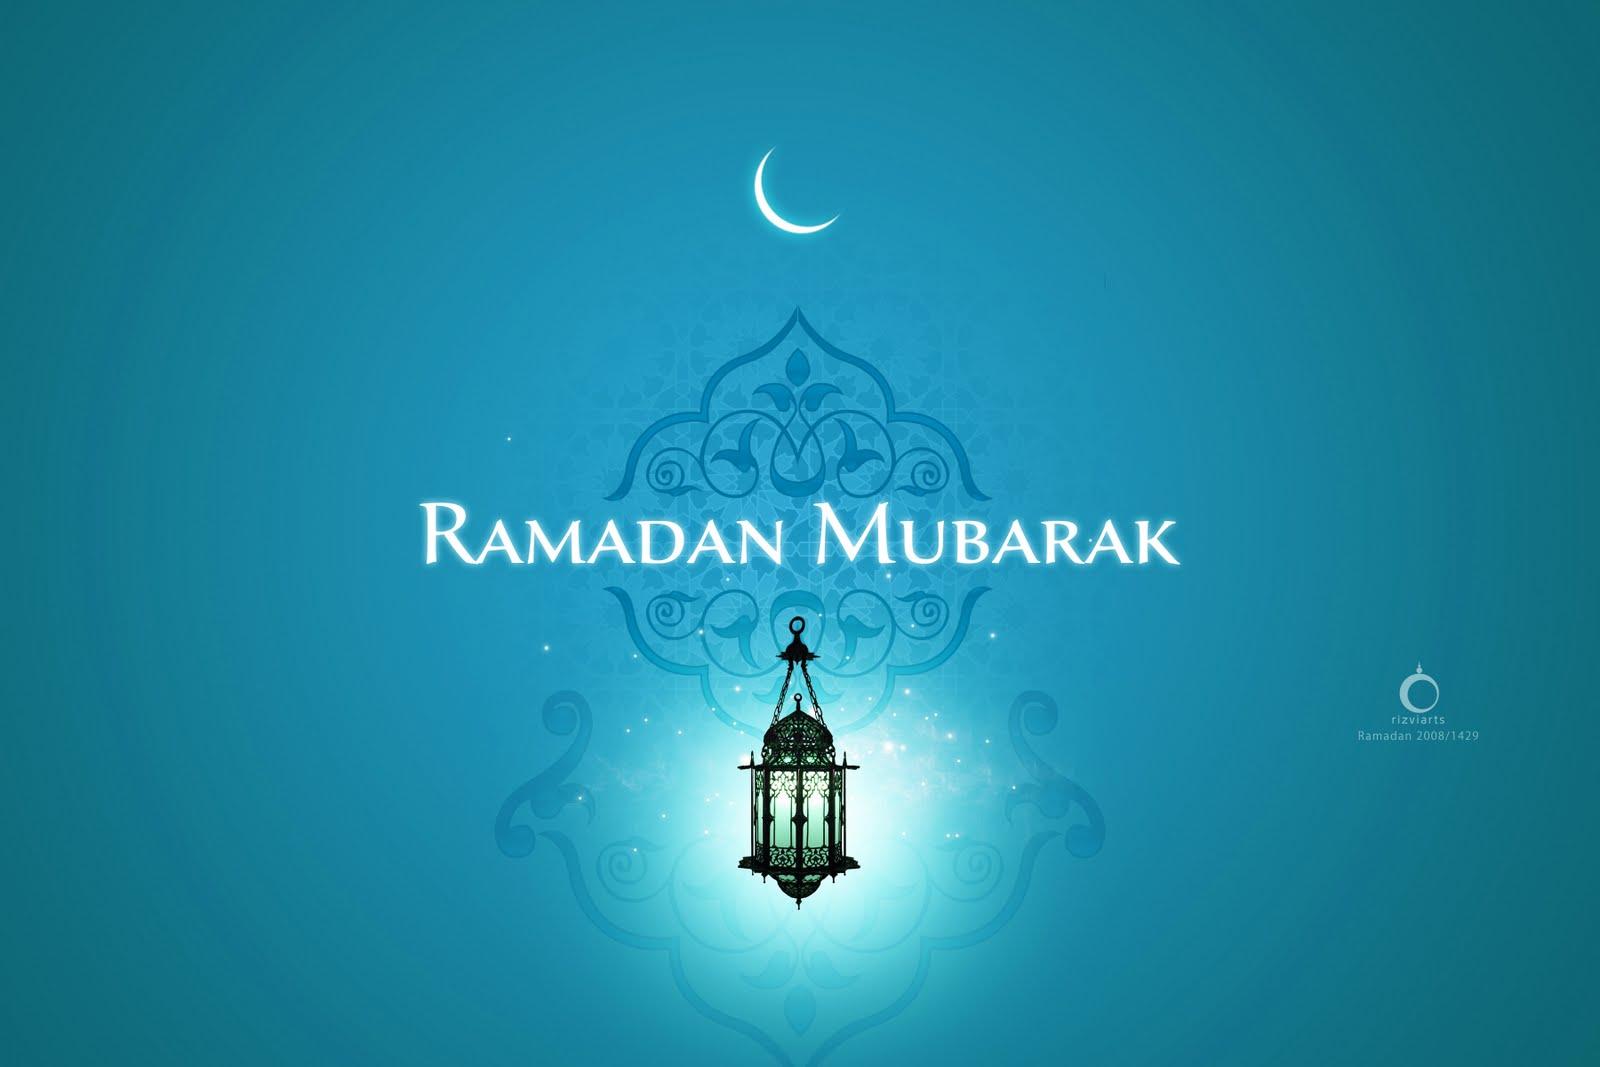 Bulan Ramadhan 2011 Bulan Ramadhan Yang Penuh